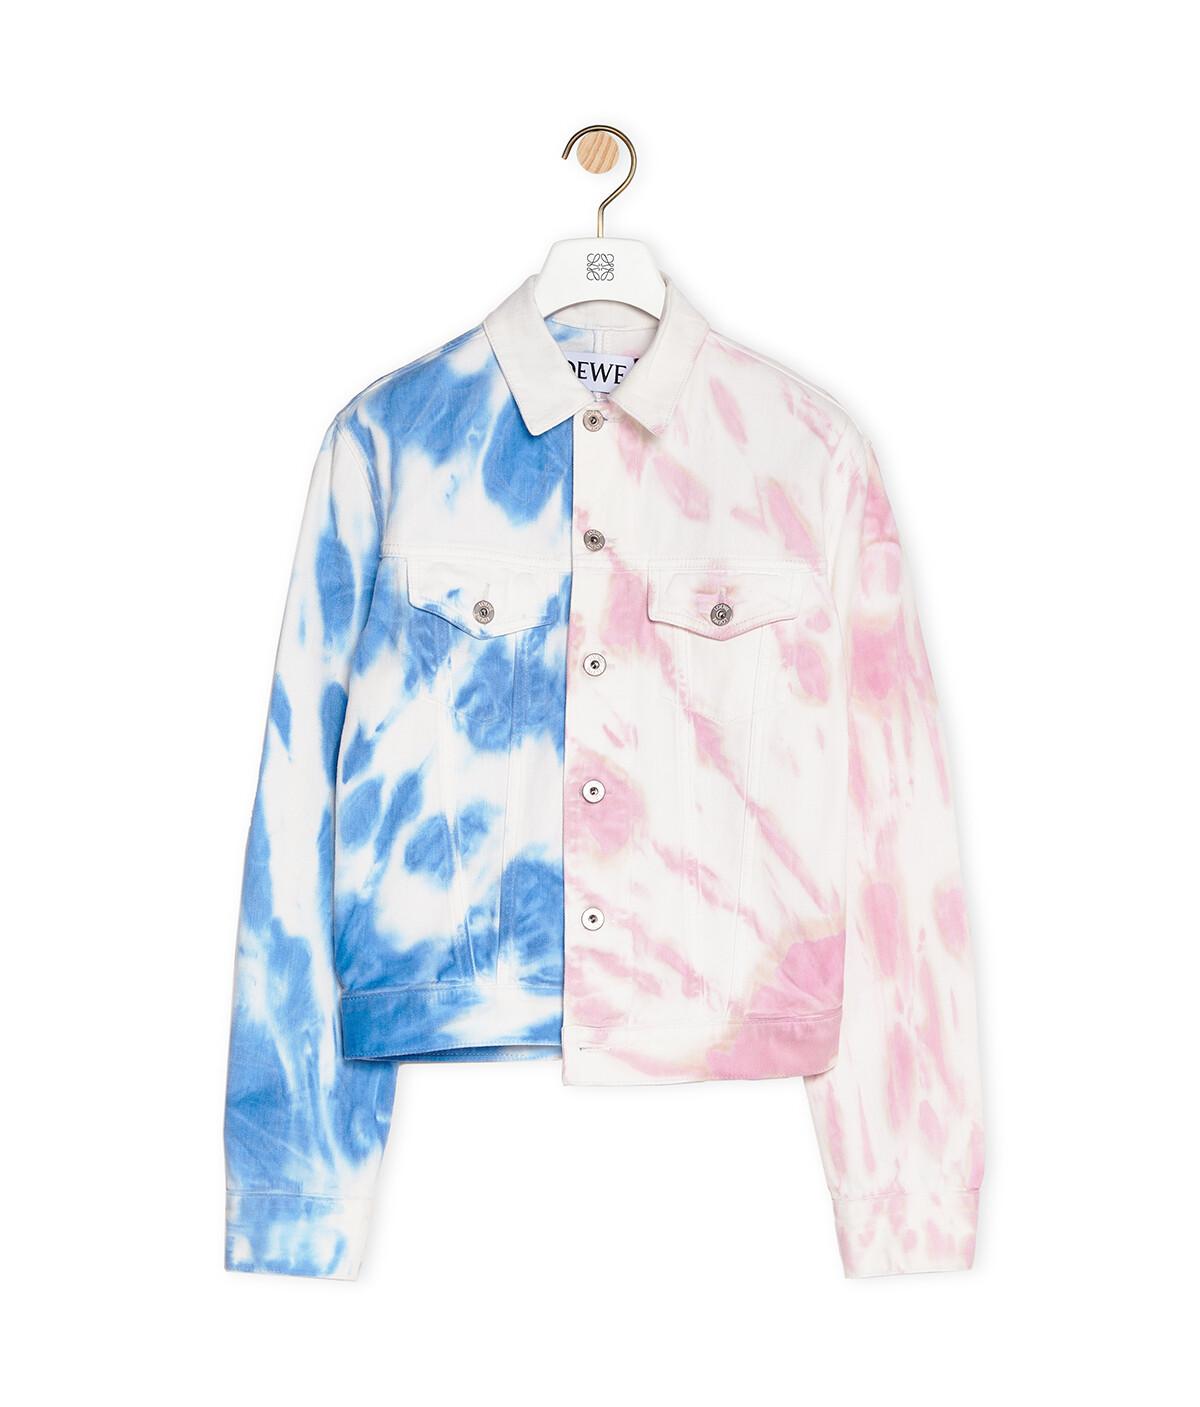 LOEWE Denim Jacket In Tie Dye Cotton Multicolor front